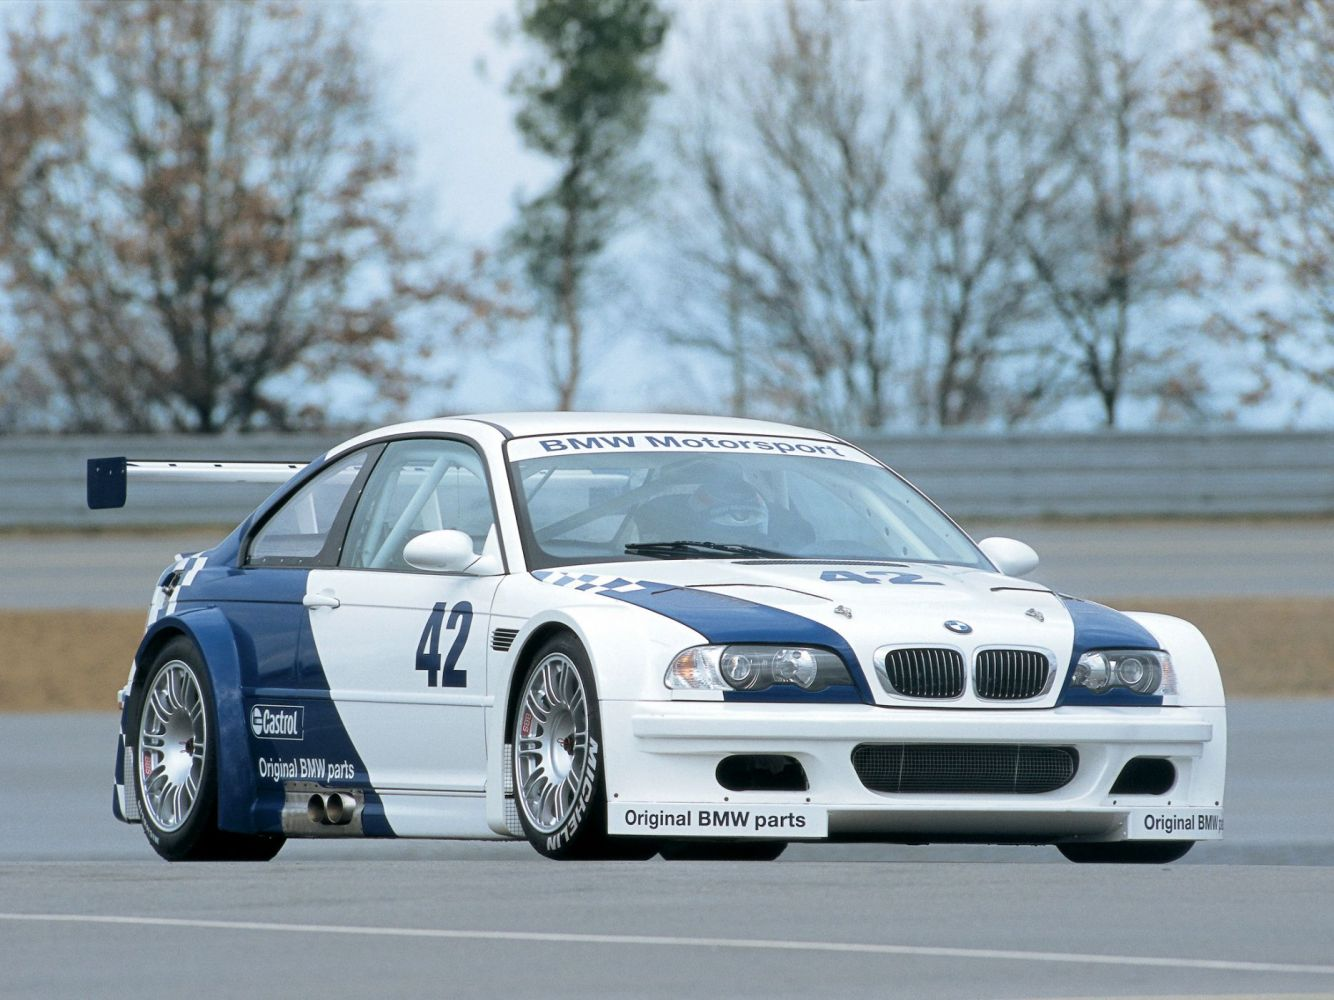 BMW M3 GTR DTM Race Car - 2001